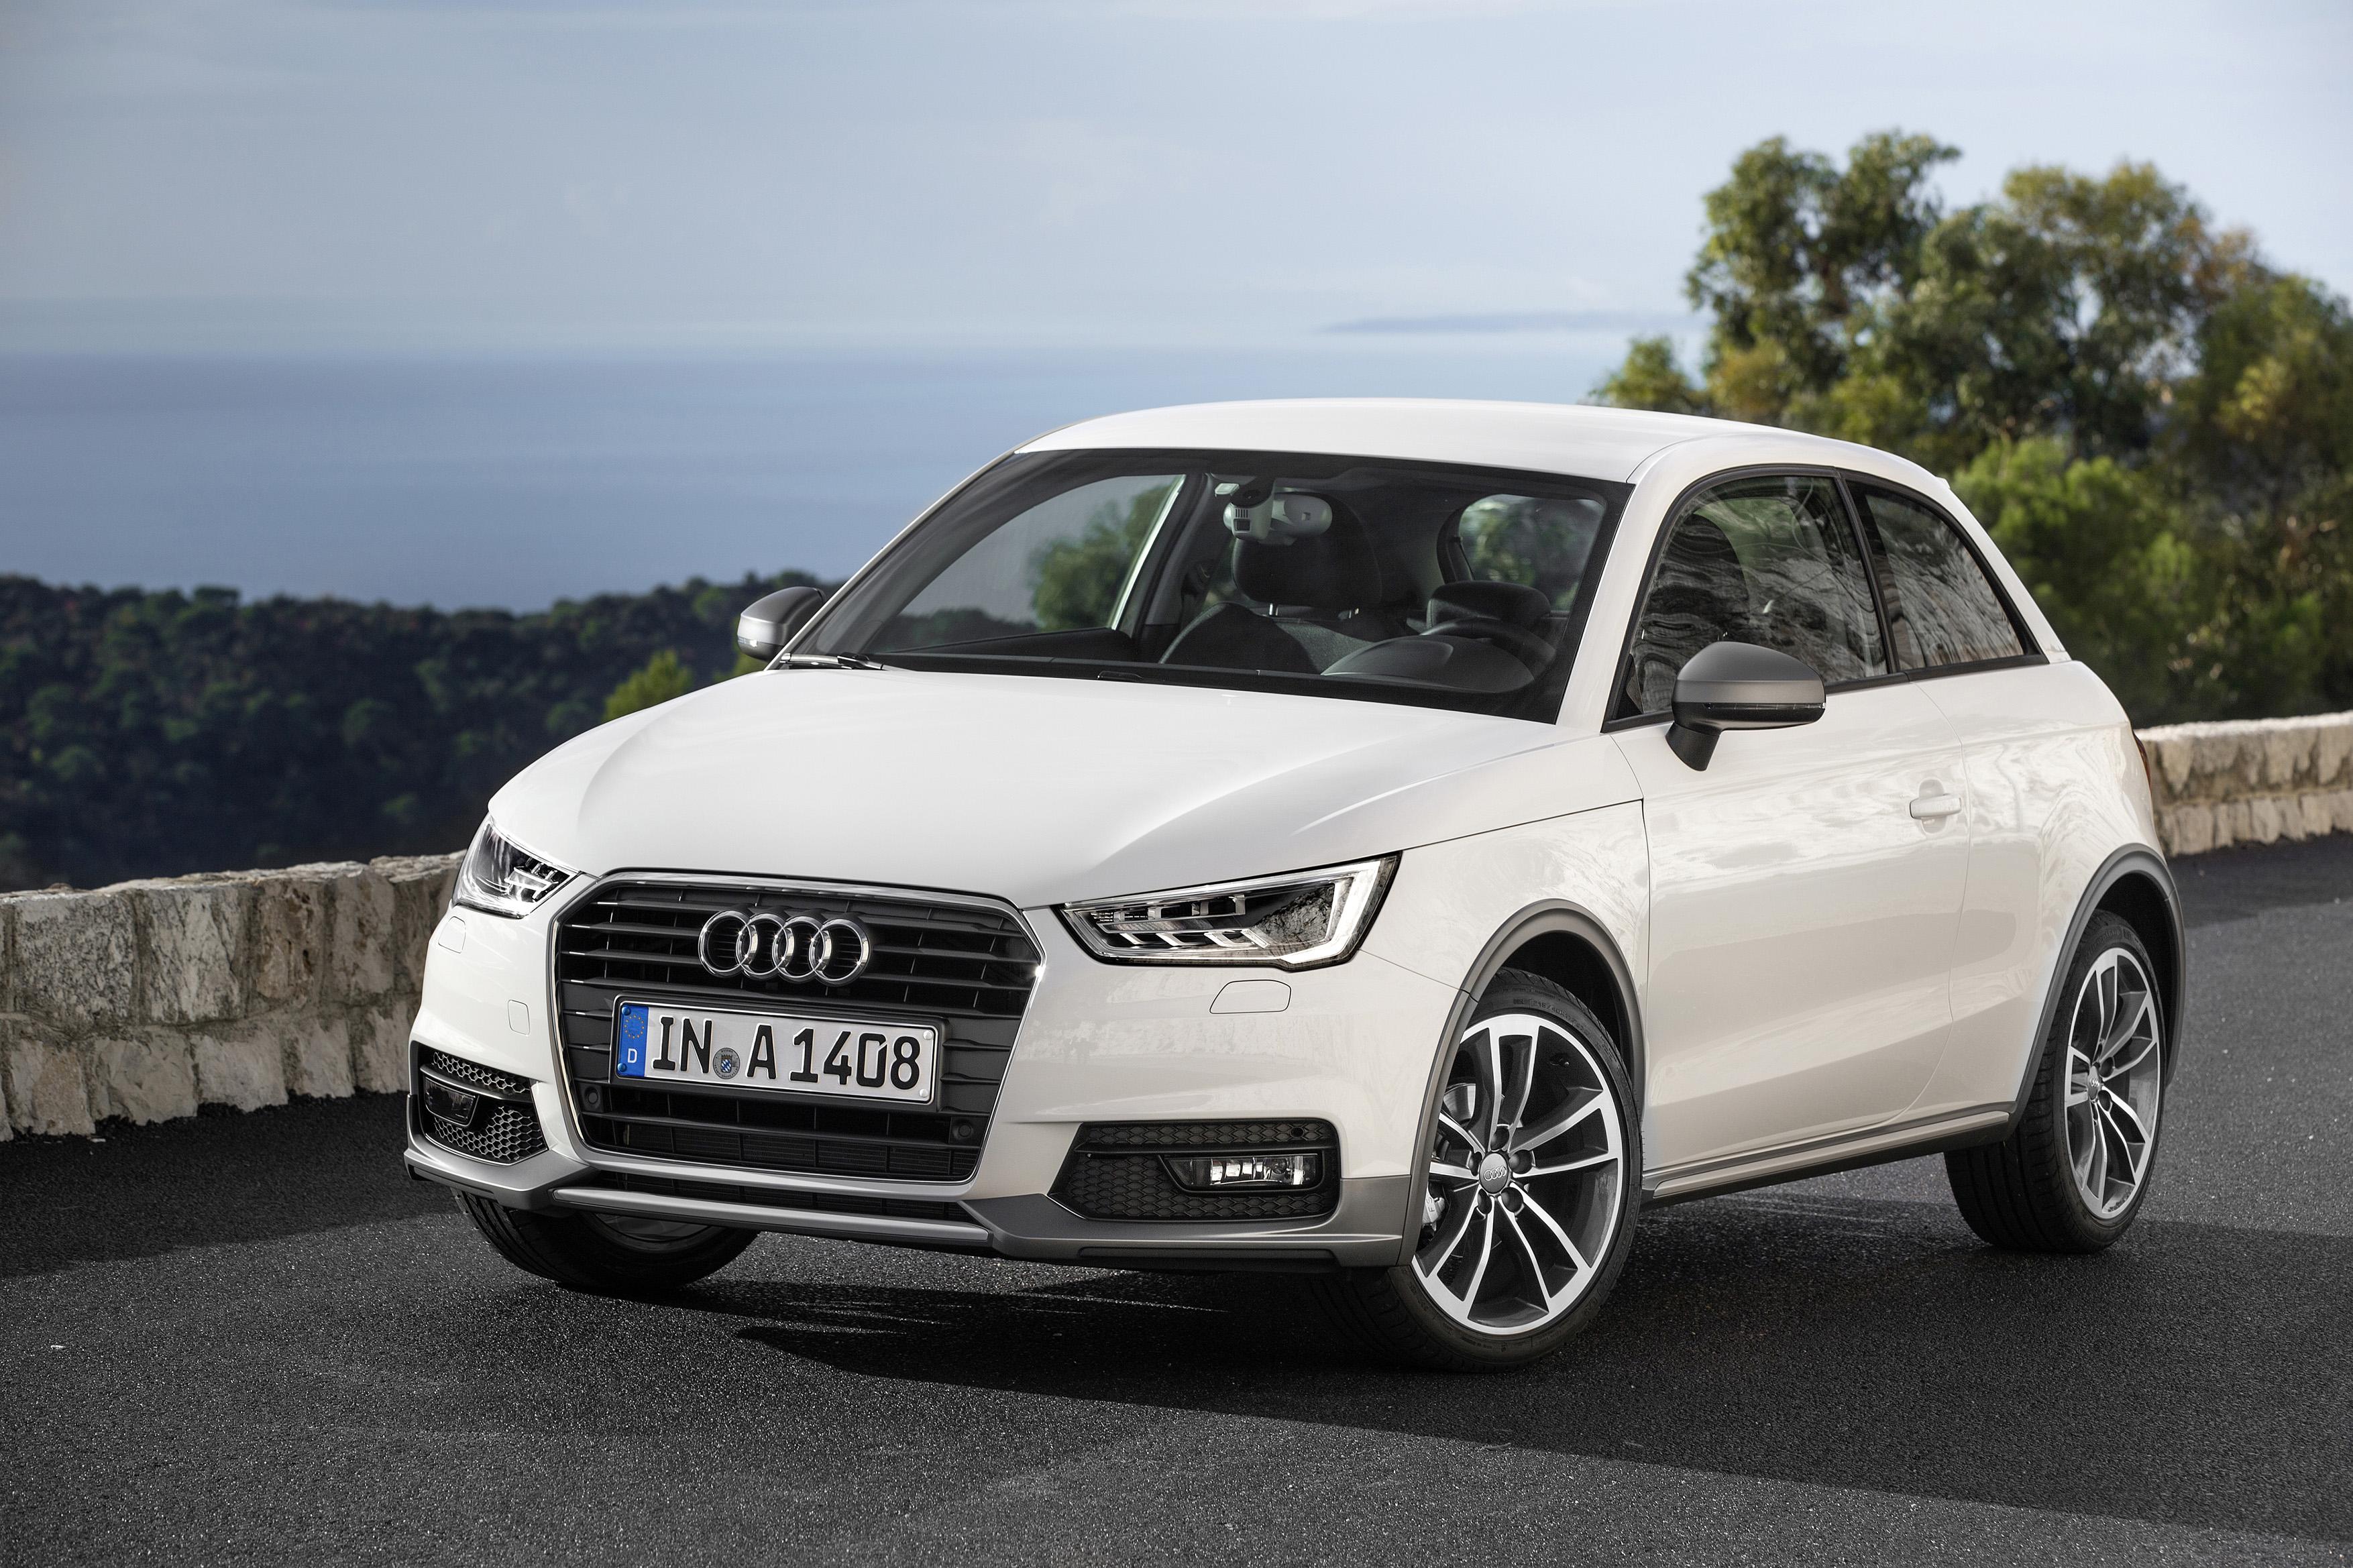 2015 Audi A1 Active Style Package Details - autoevolution